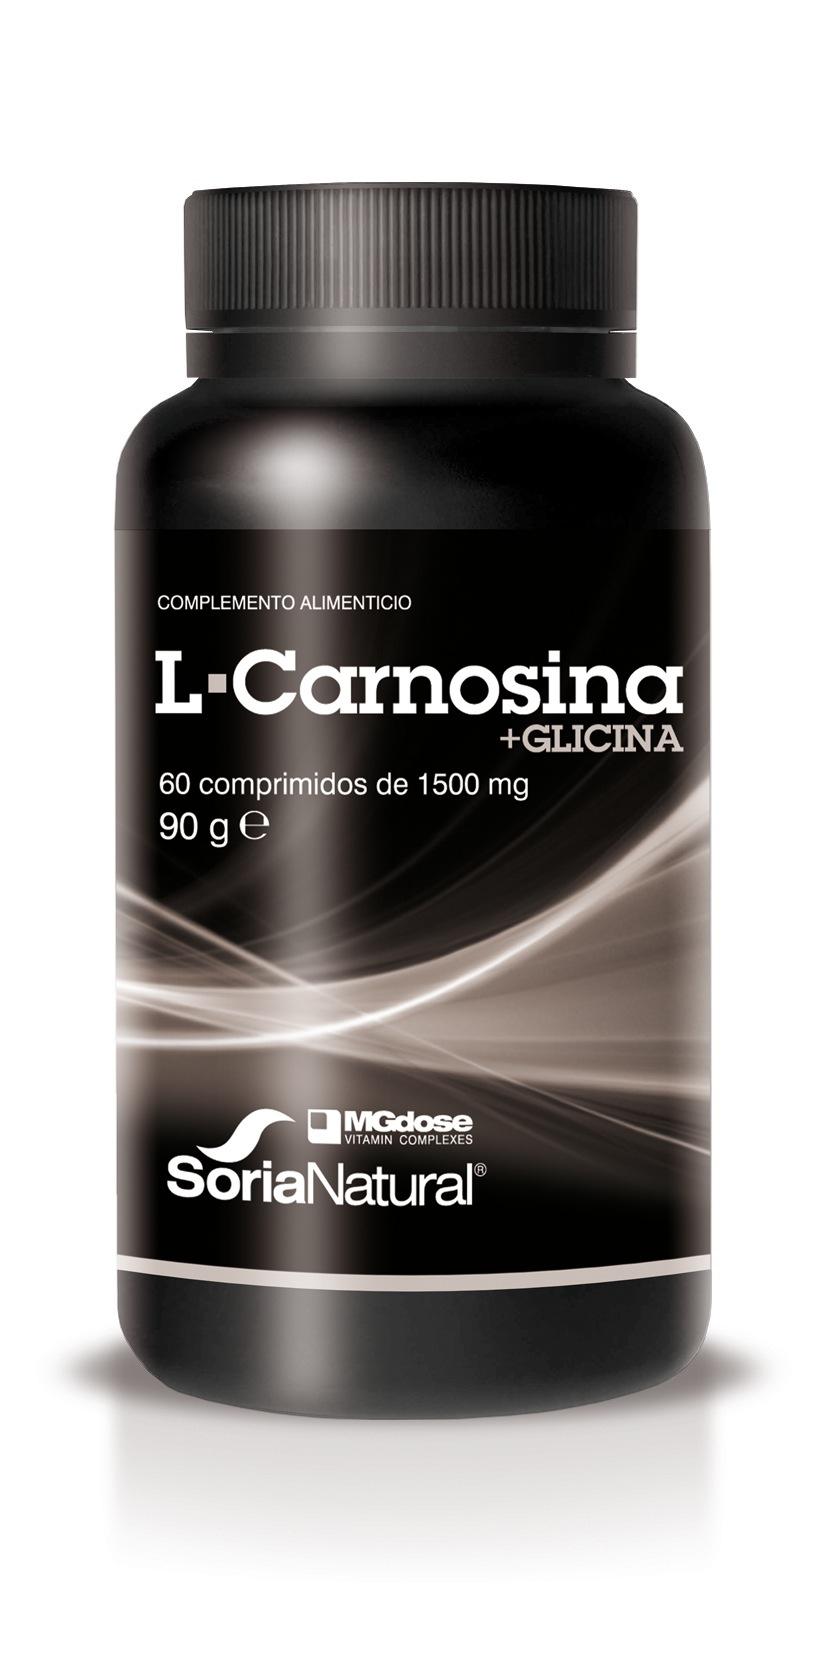 L-Carnosina + glicina